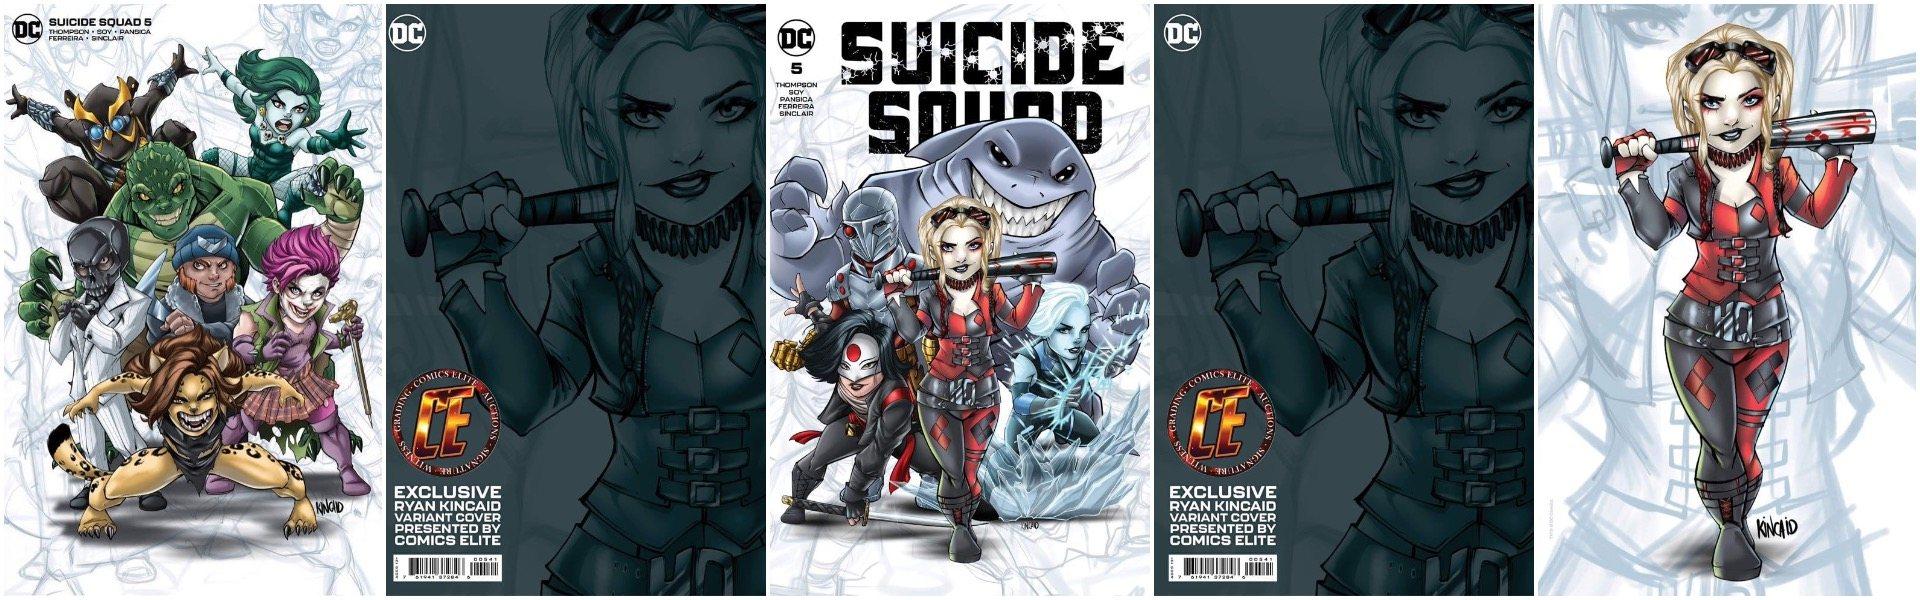 Suicide Squad #5 Ryan Kincaid Chibi Variants